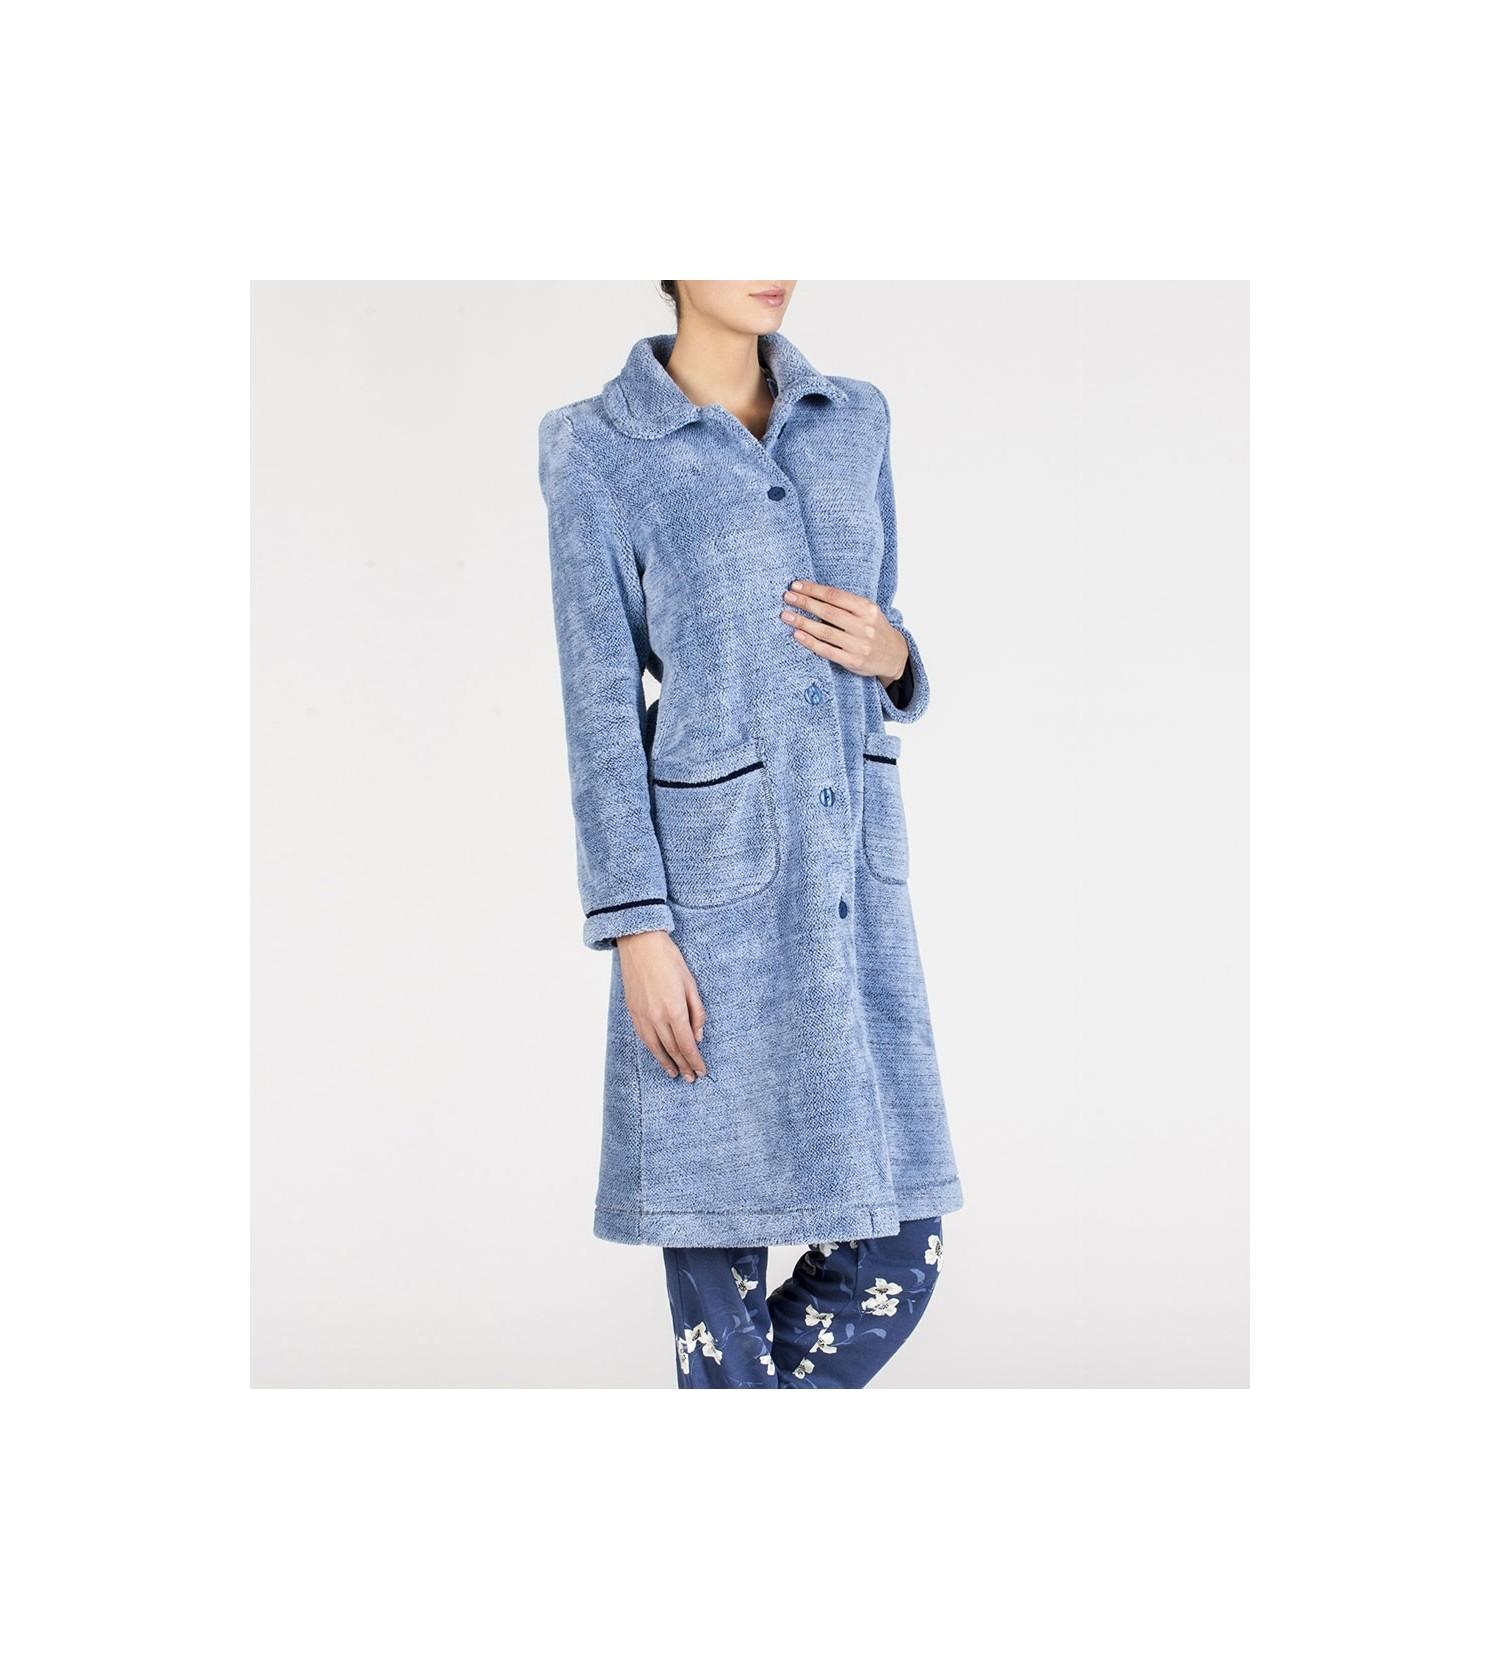 Robe de chambre boutonn e femme bleu egatex lingerie sipp - Robes de chambre de marque ...